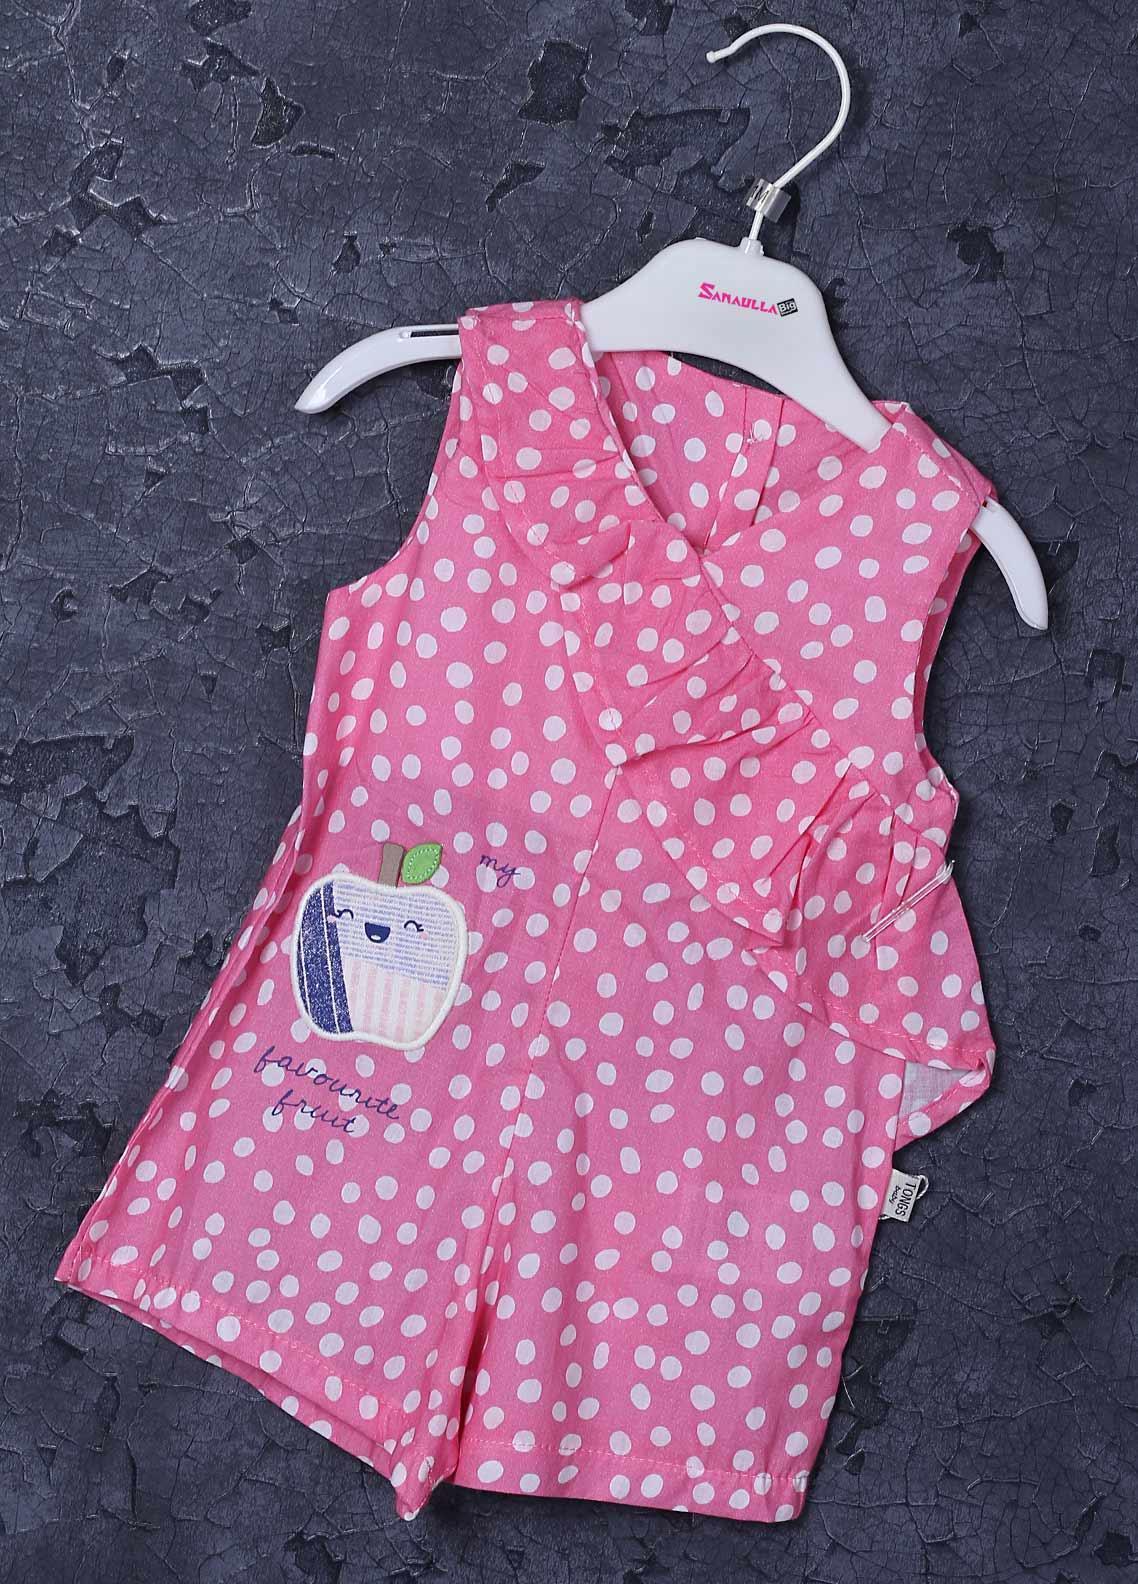 Sanaulla Exclusive Range Cotton Fancy Girls Frocks -  2534 Dark Pink